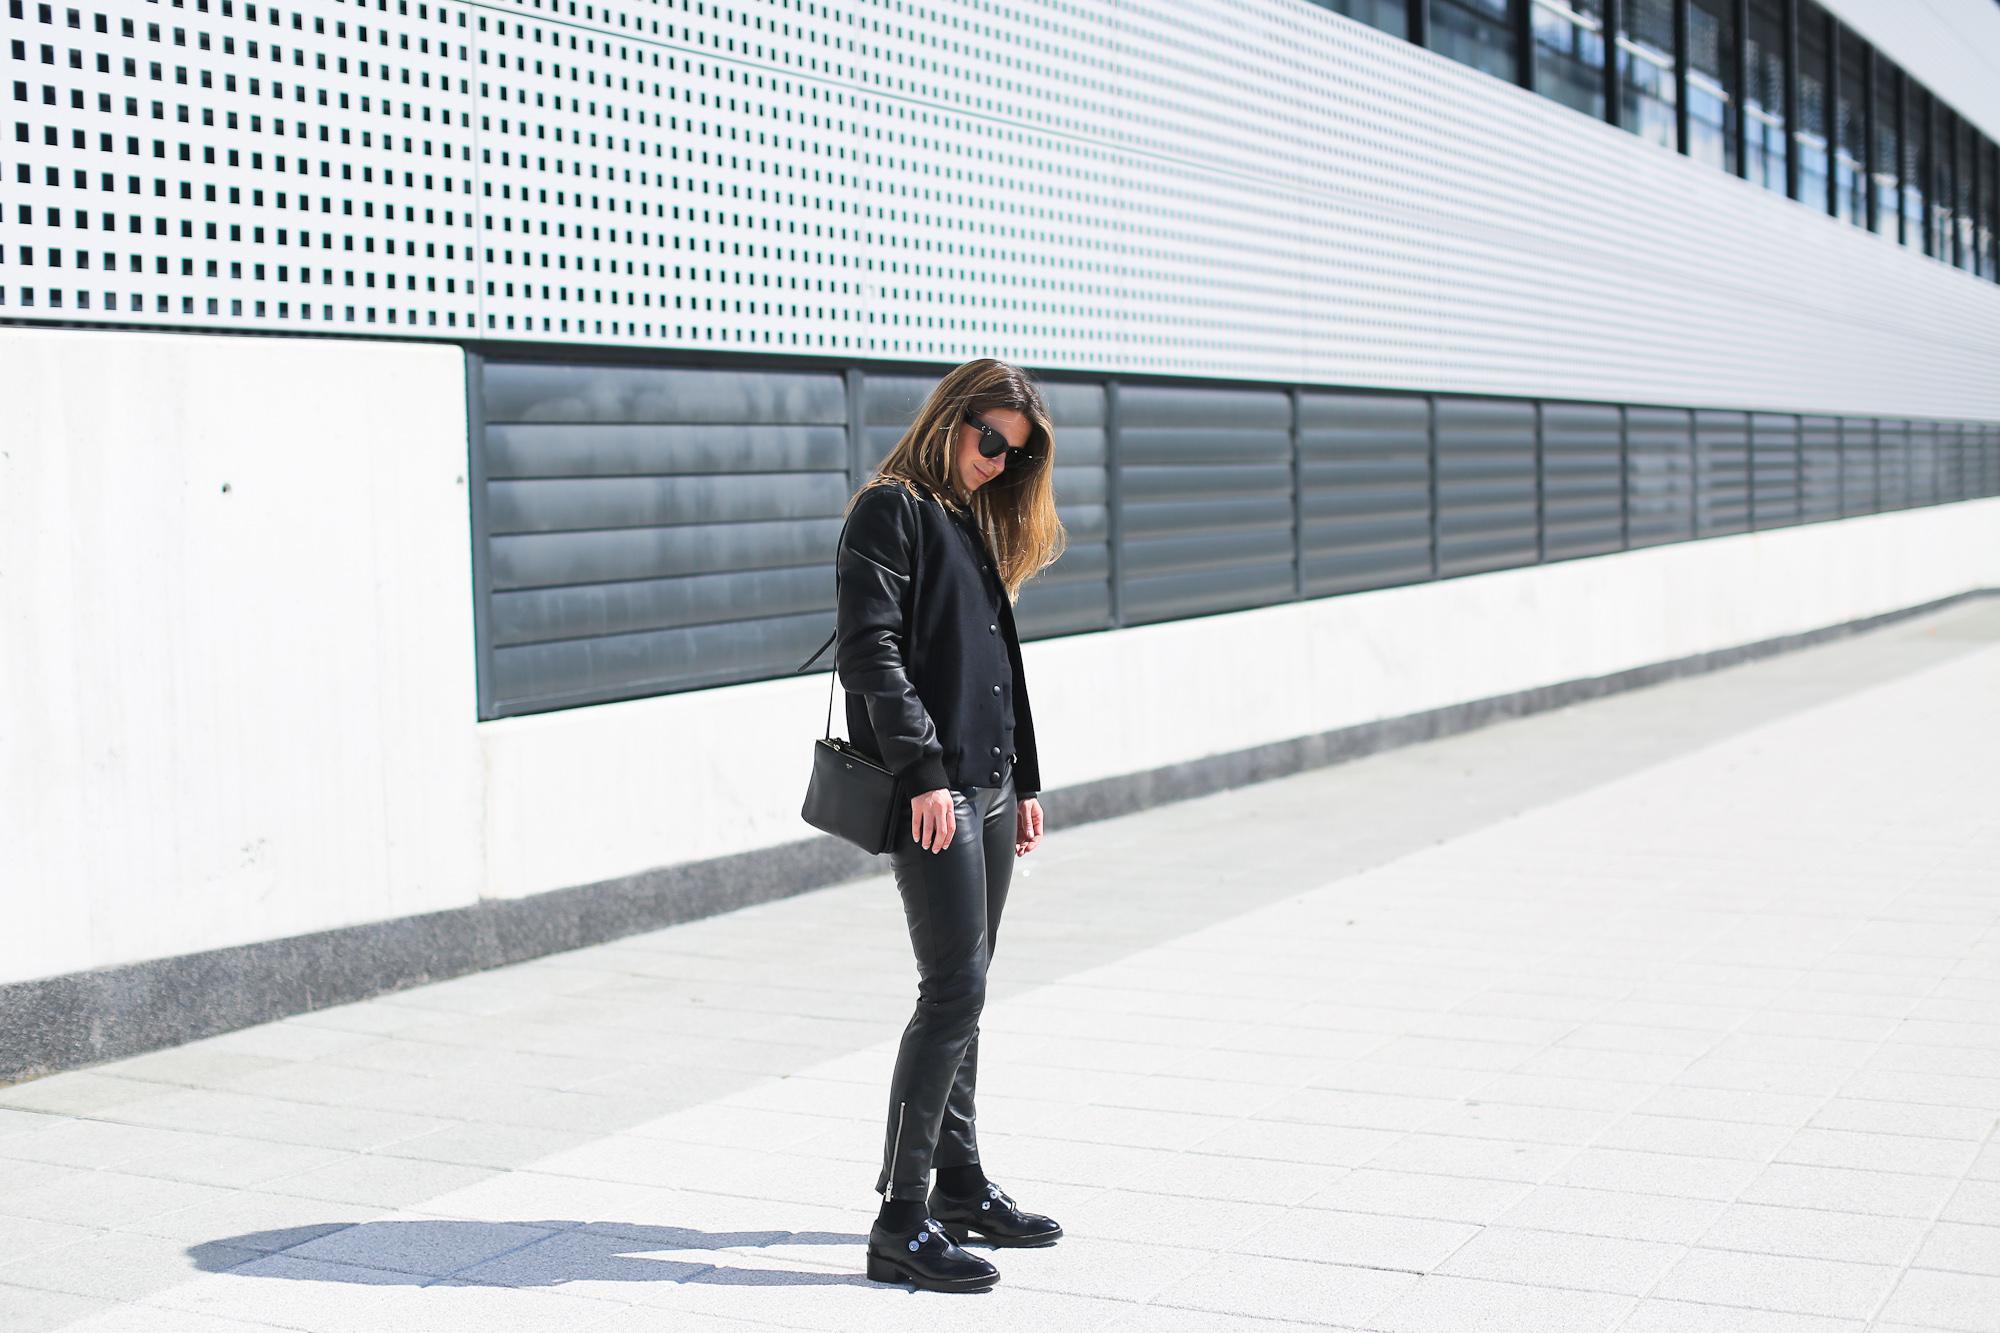 Clochet_streetstyle_pantalones_piel_suiteblanco_zapatos_planos_sandro-2